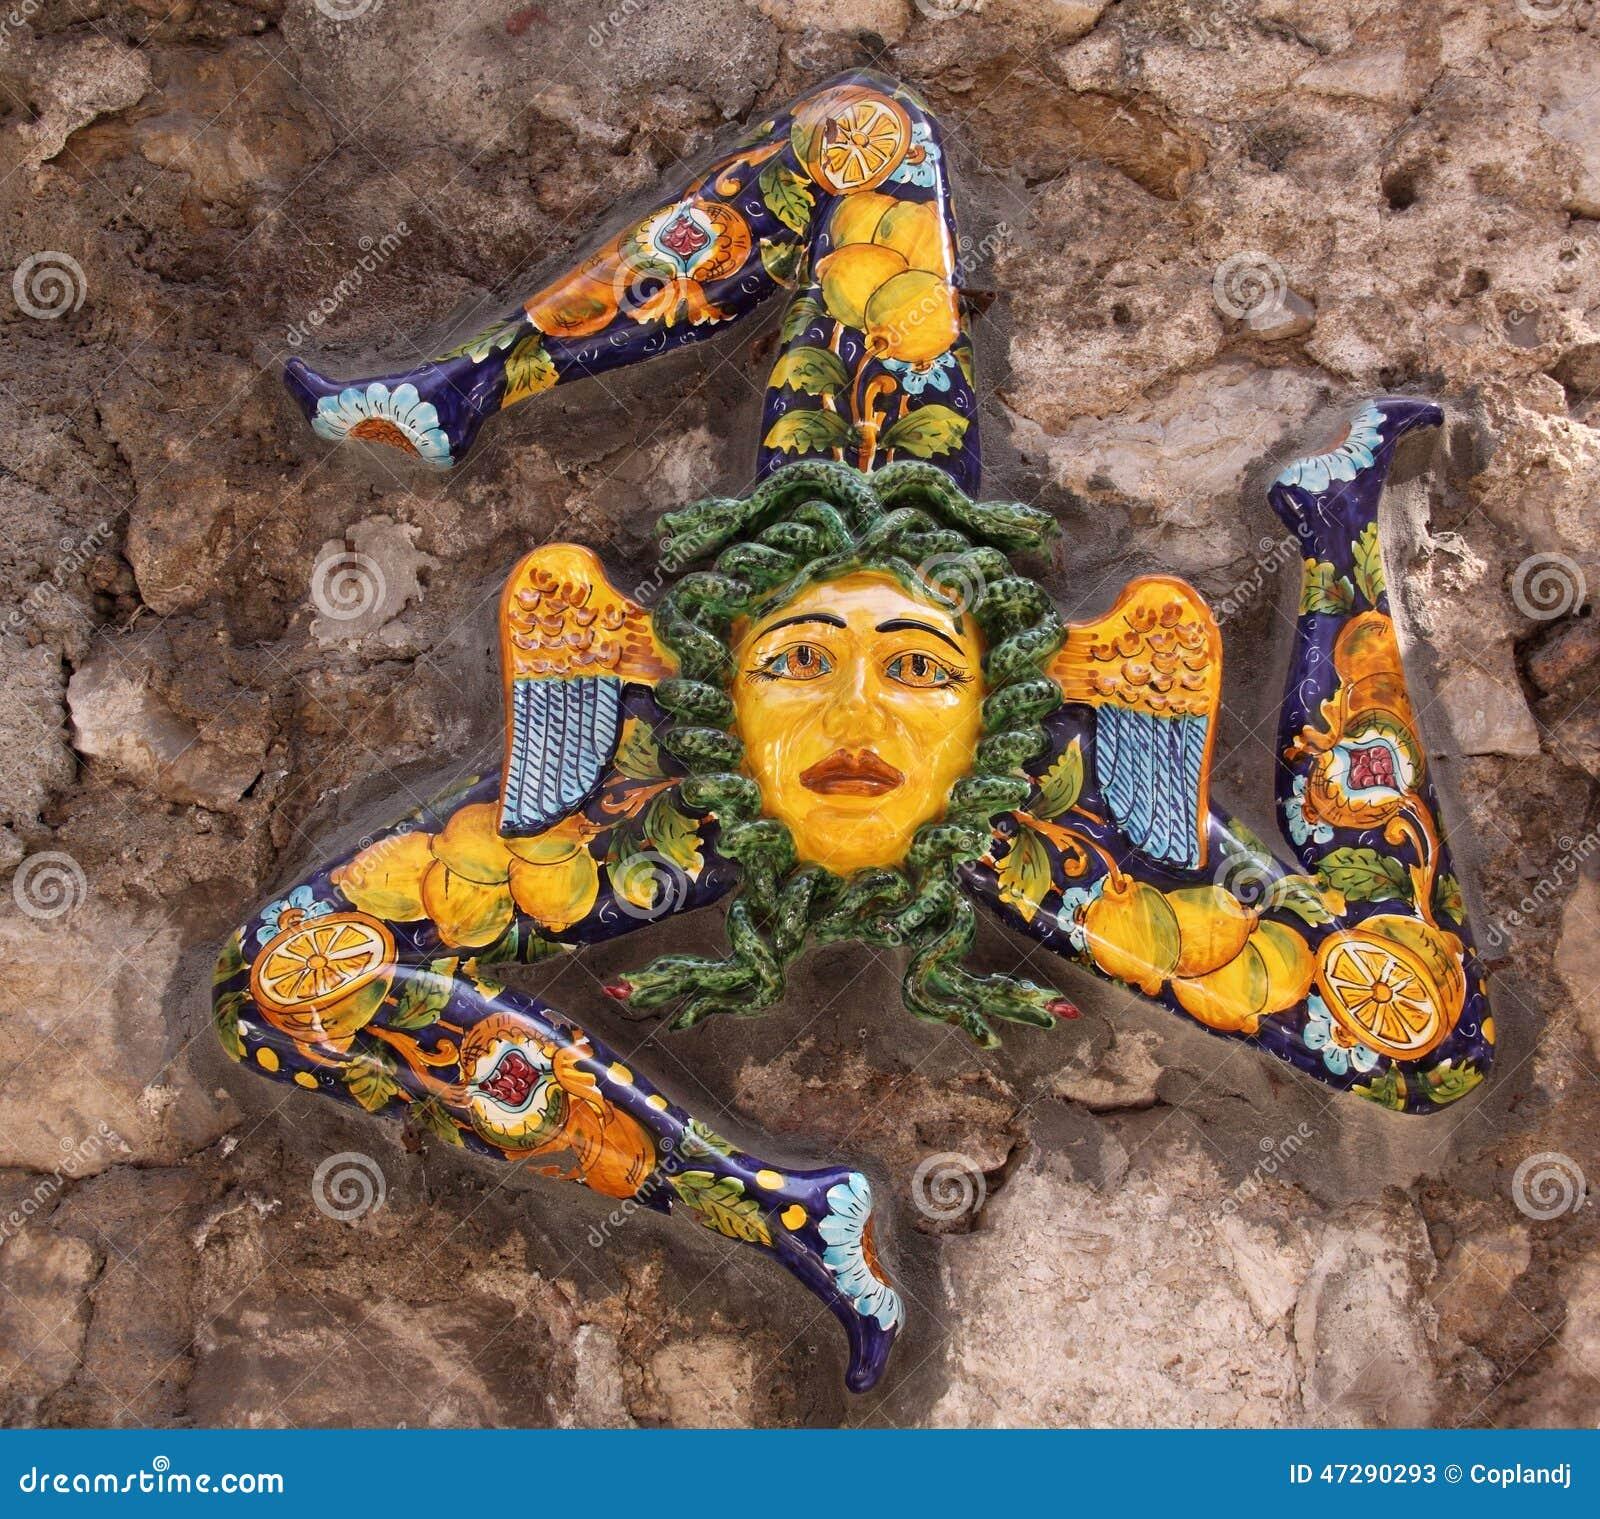 Troina Italy  City pictures : Italy, Sicily, Taormina. Trinacria the ancient symbol of Sicily in ...